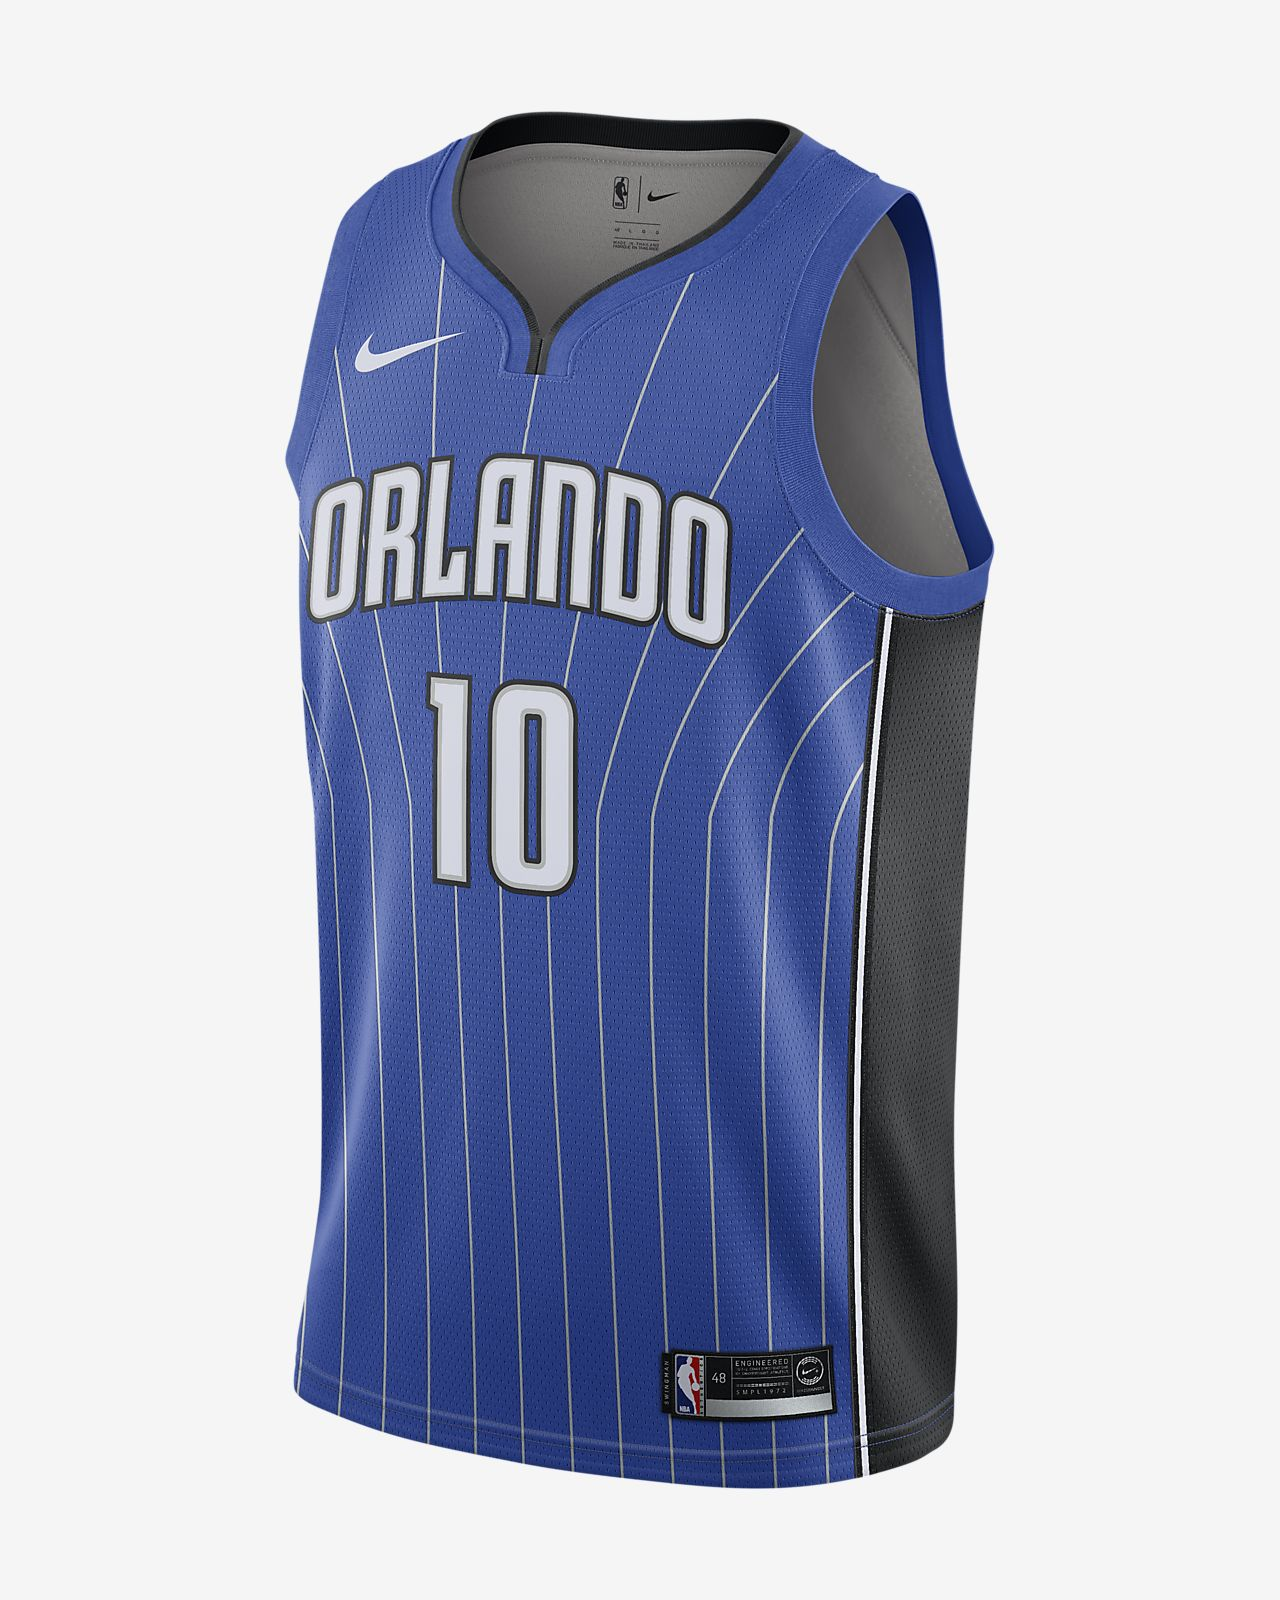 Maillot connecté Nike NBA Evan Fournier Icon Edition Swingman (Orlando Magic) pour Homme